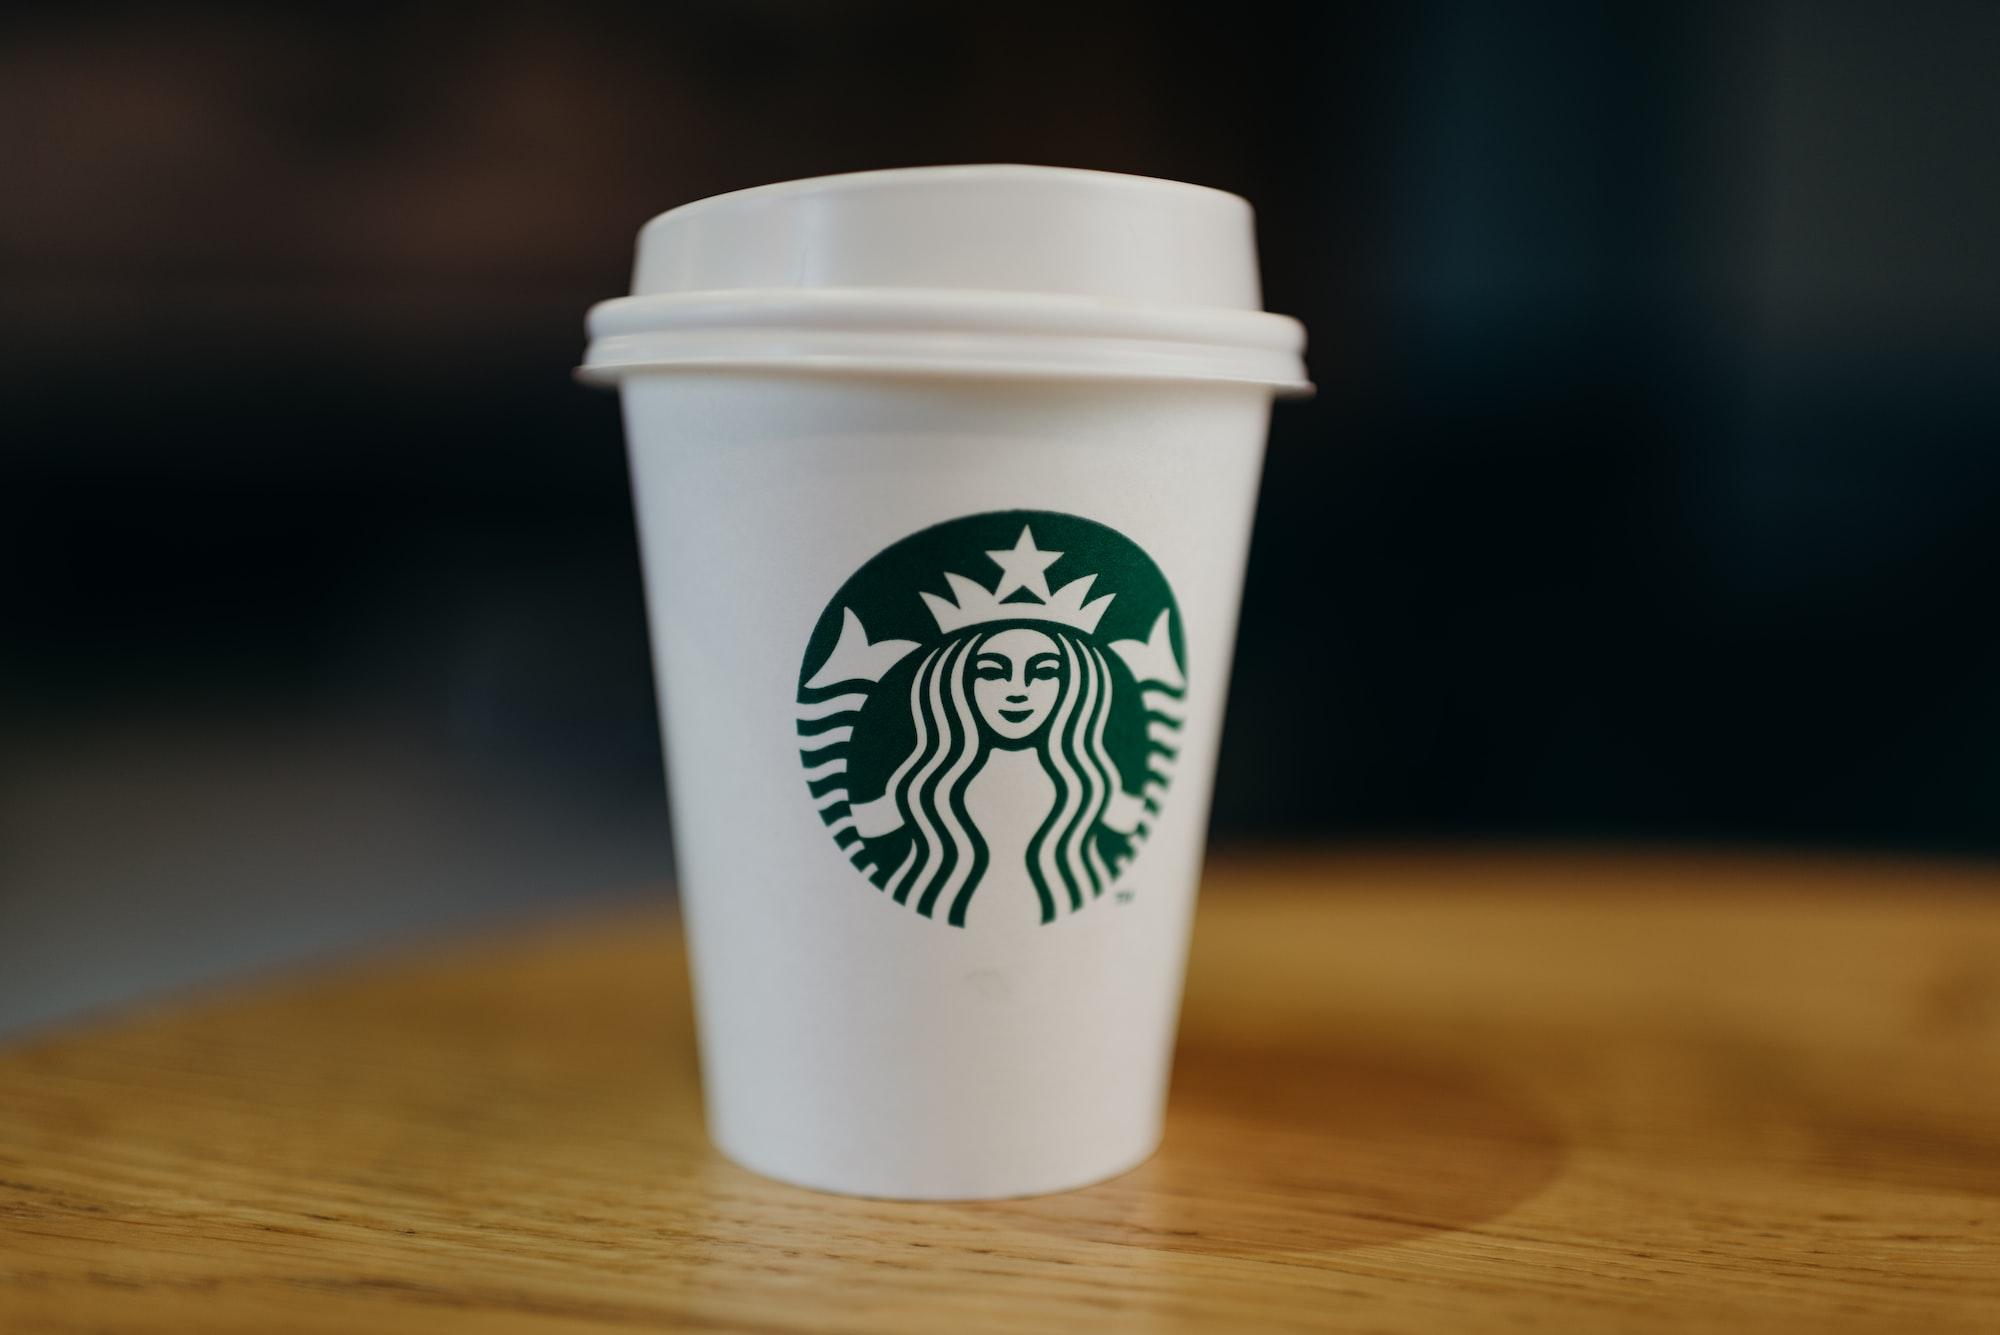 Starbucks' China Problem